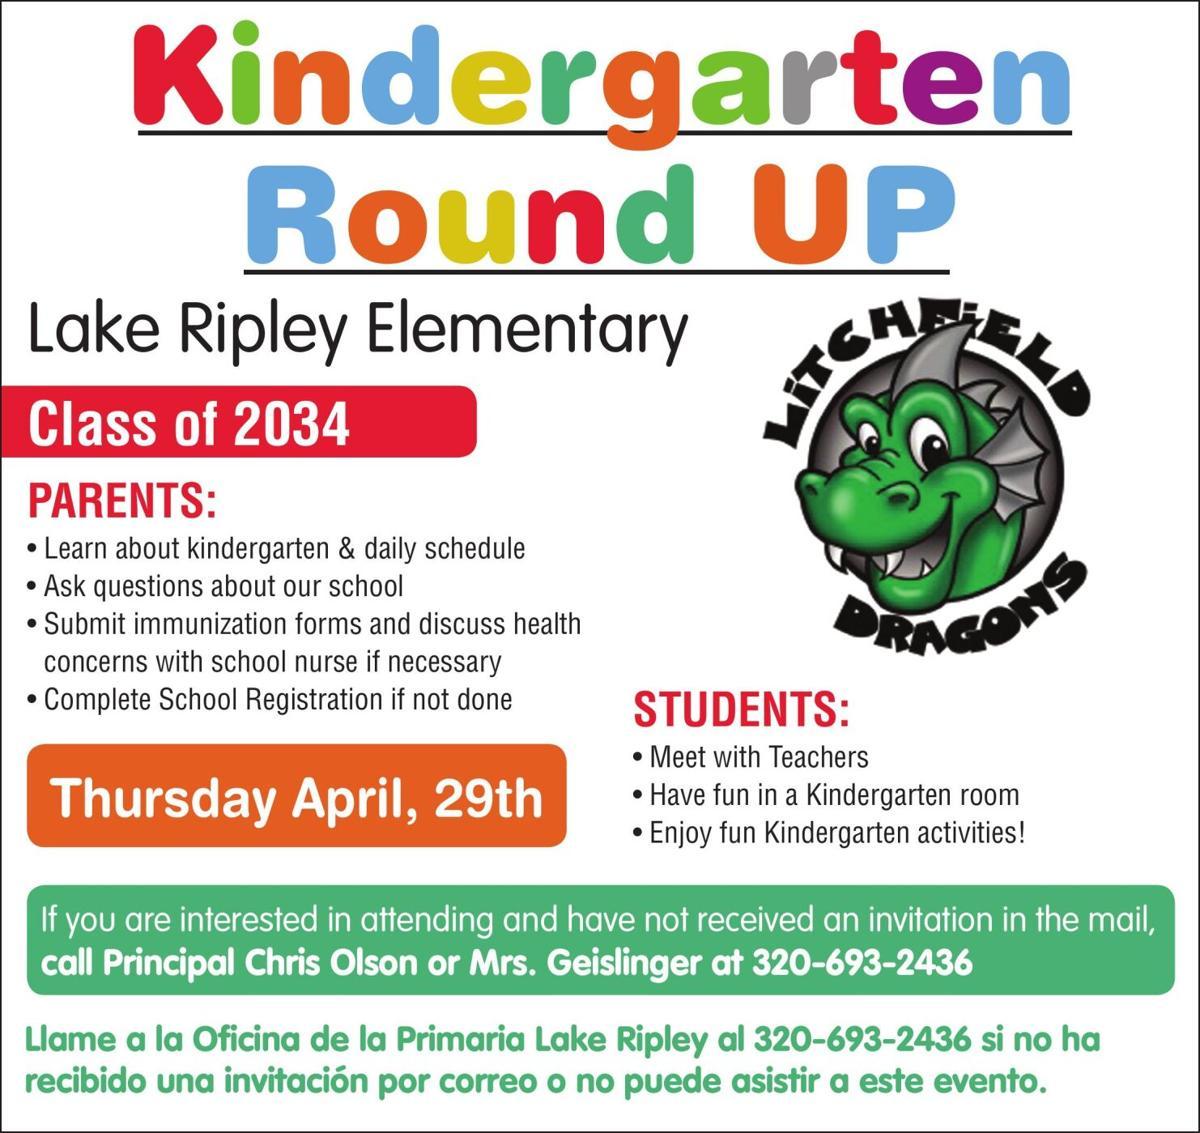 Kindergarten Round UP Lake Ripley